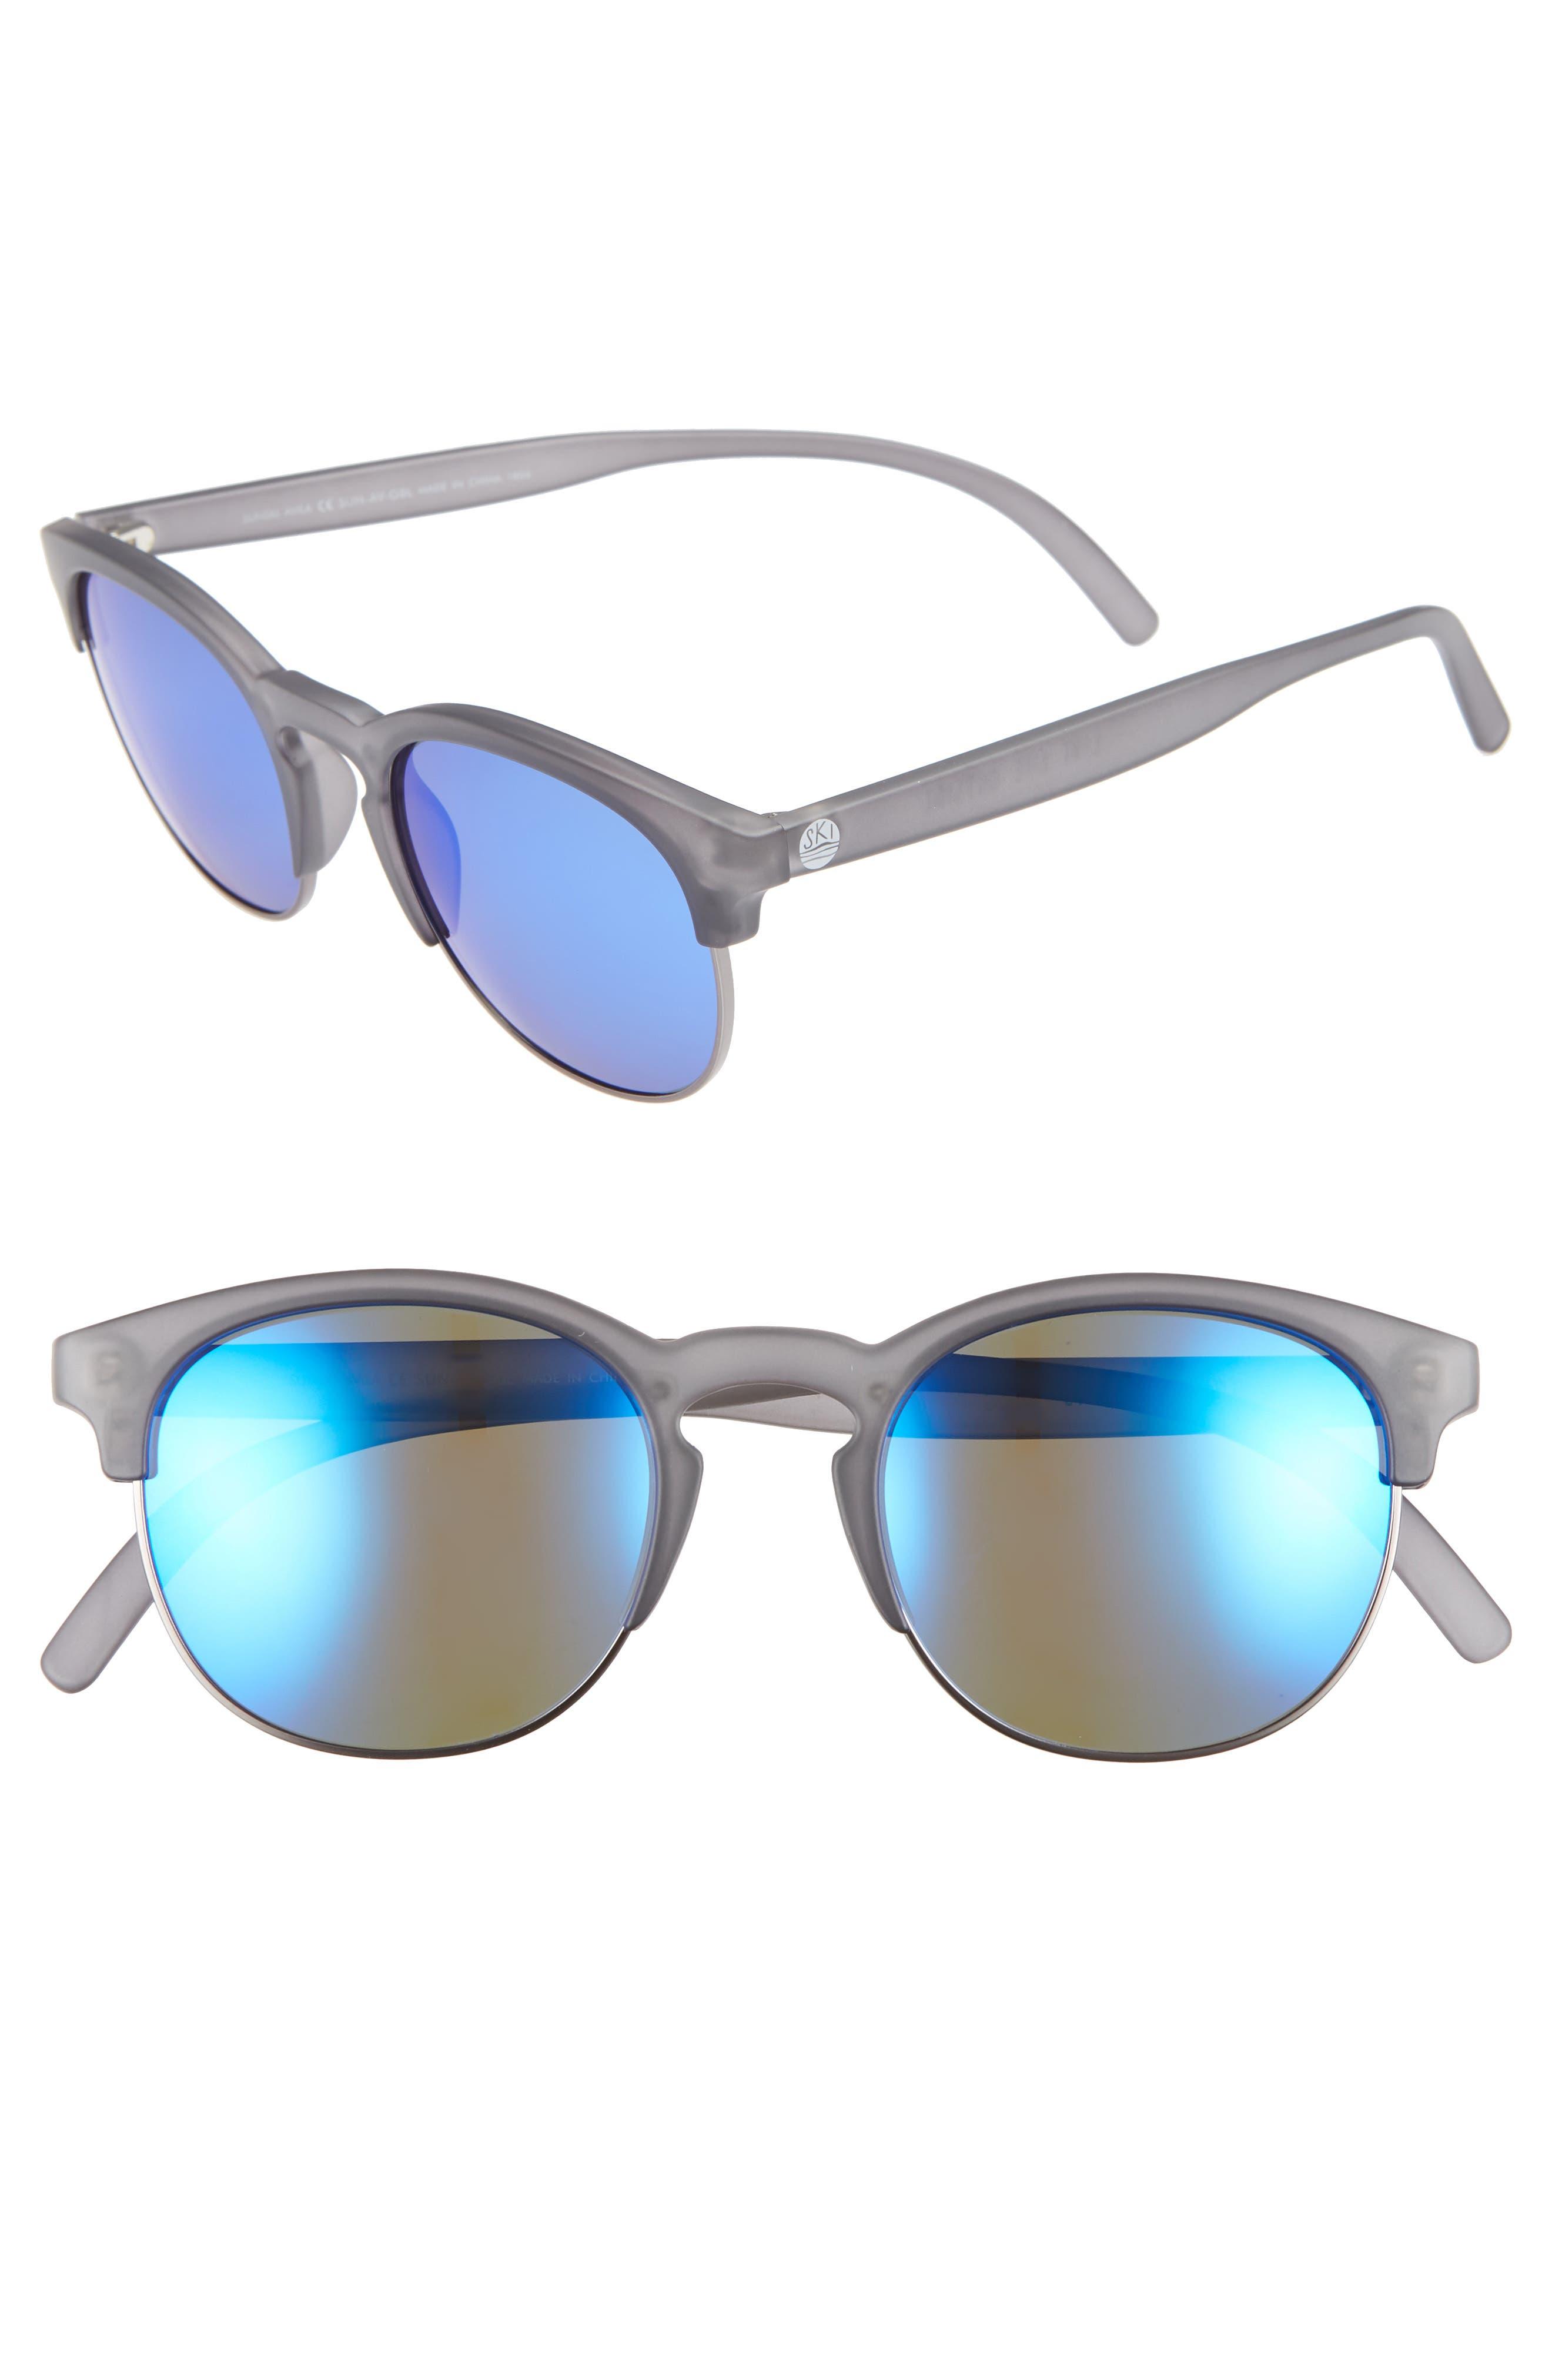 Sunski Avilas 51Mm Polarized Sunglasses - Grey/blue